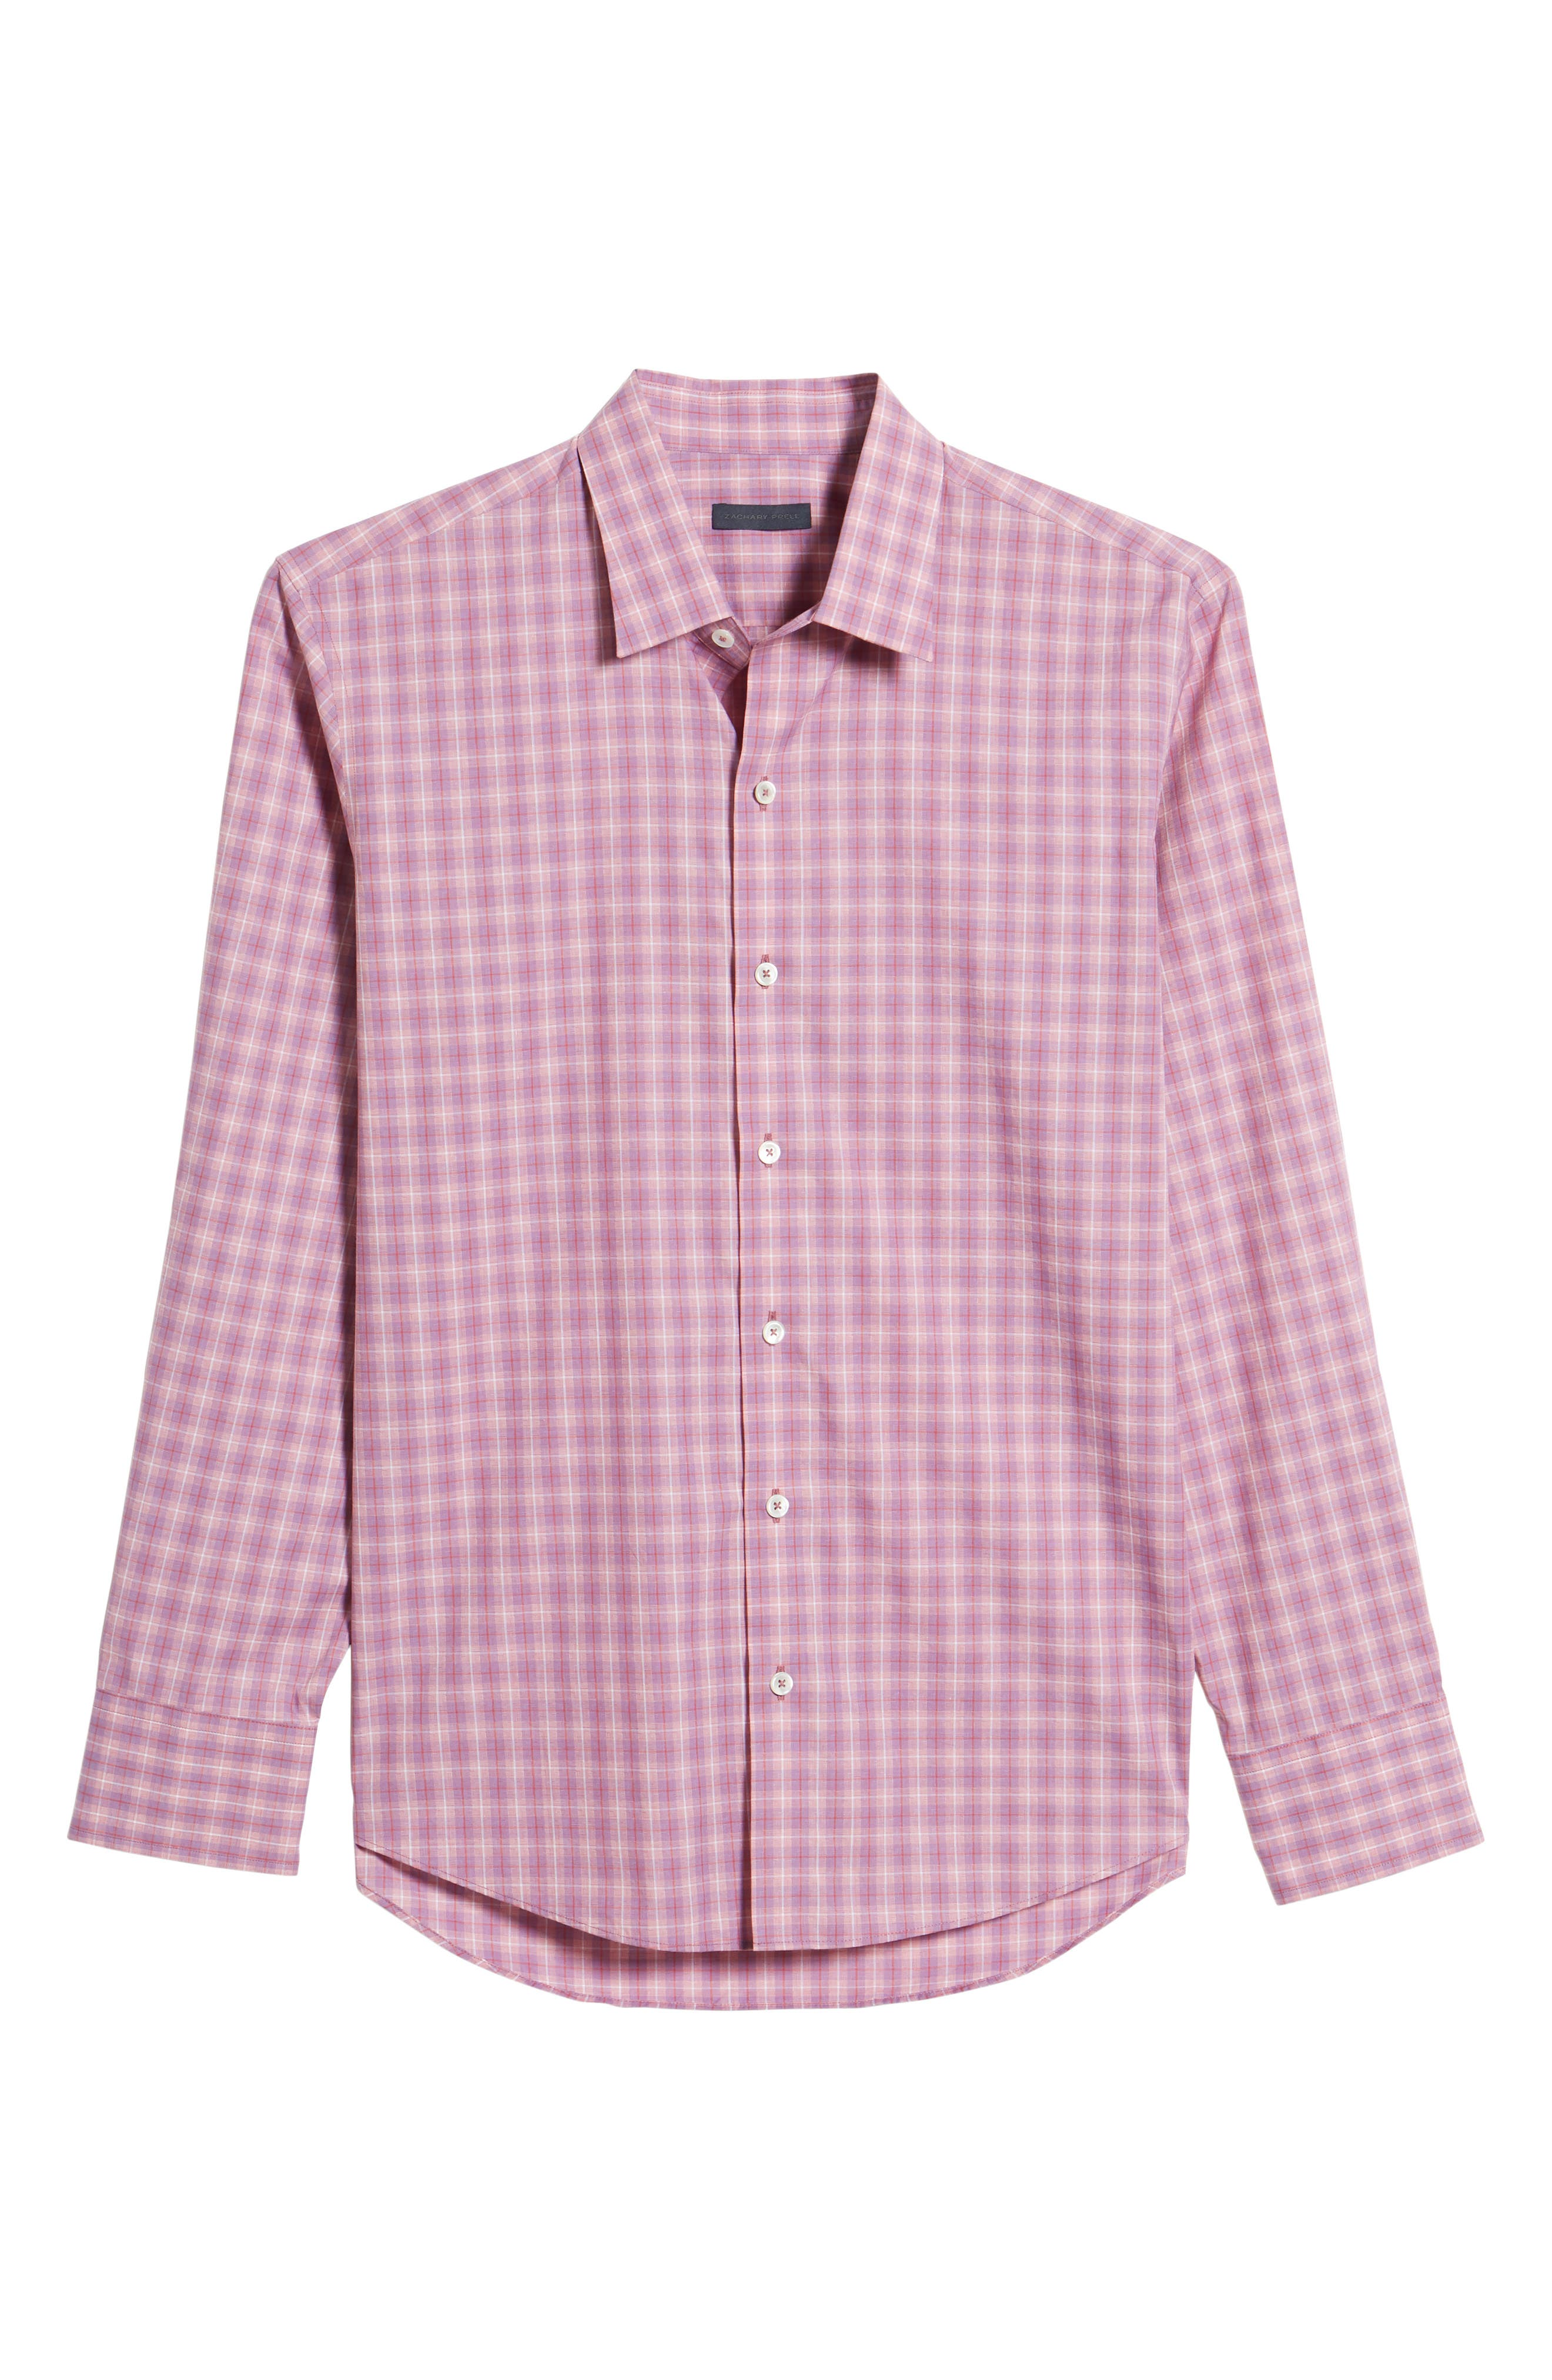 ZACHARY PRELL, Duran Regular Fit Sport Shirt, Alternate thumbnail 6, color, PINK